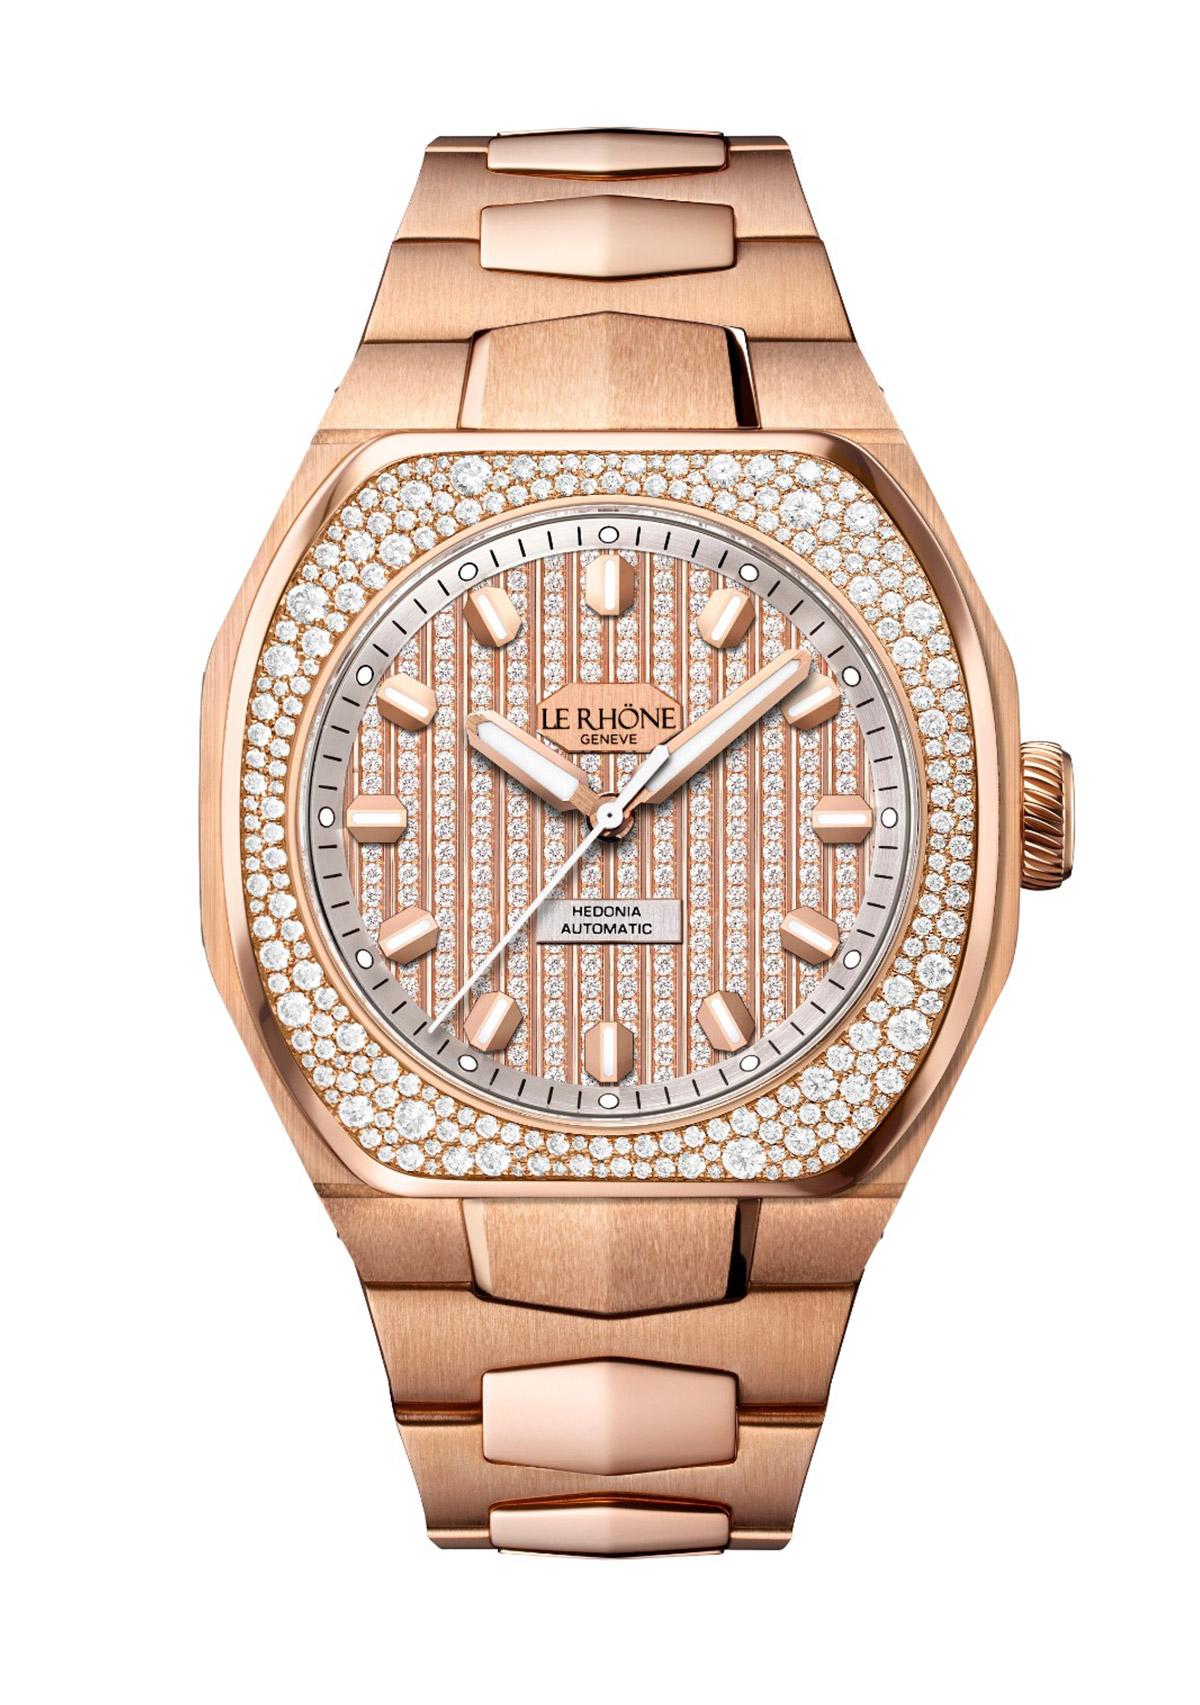 high-jewelery-hedonia-le-rhone-watch-H1PG1J1-1-P00D